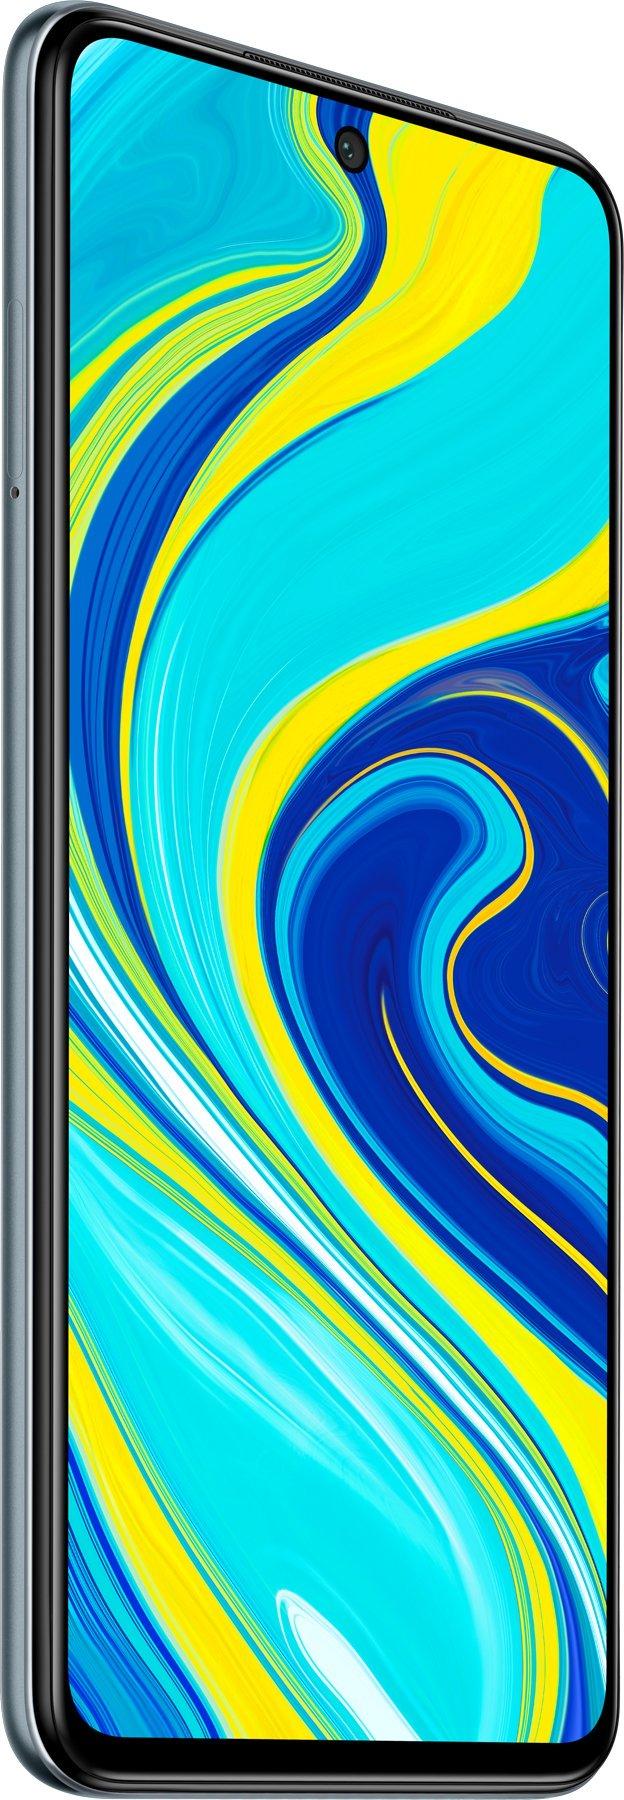 Xiaomi Redmi Note 9S 6GB/128GB 866333052375001 - 3